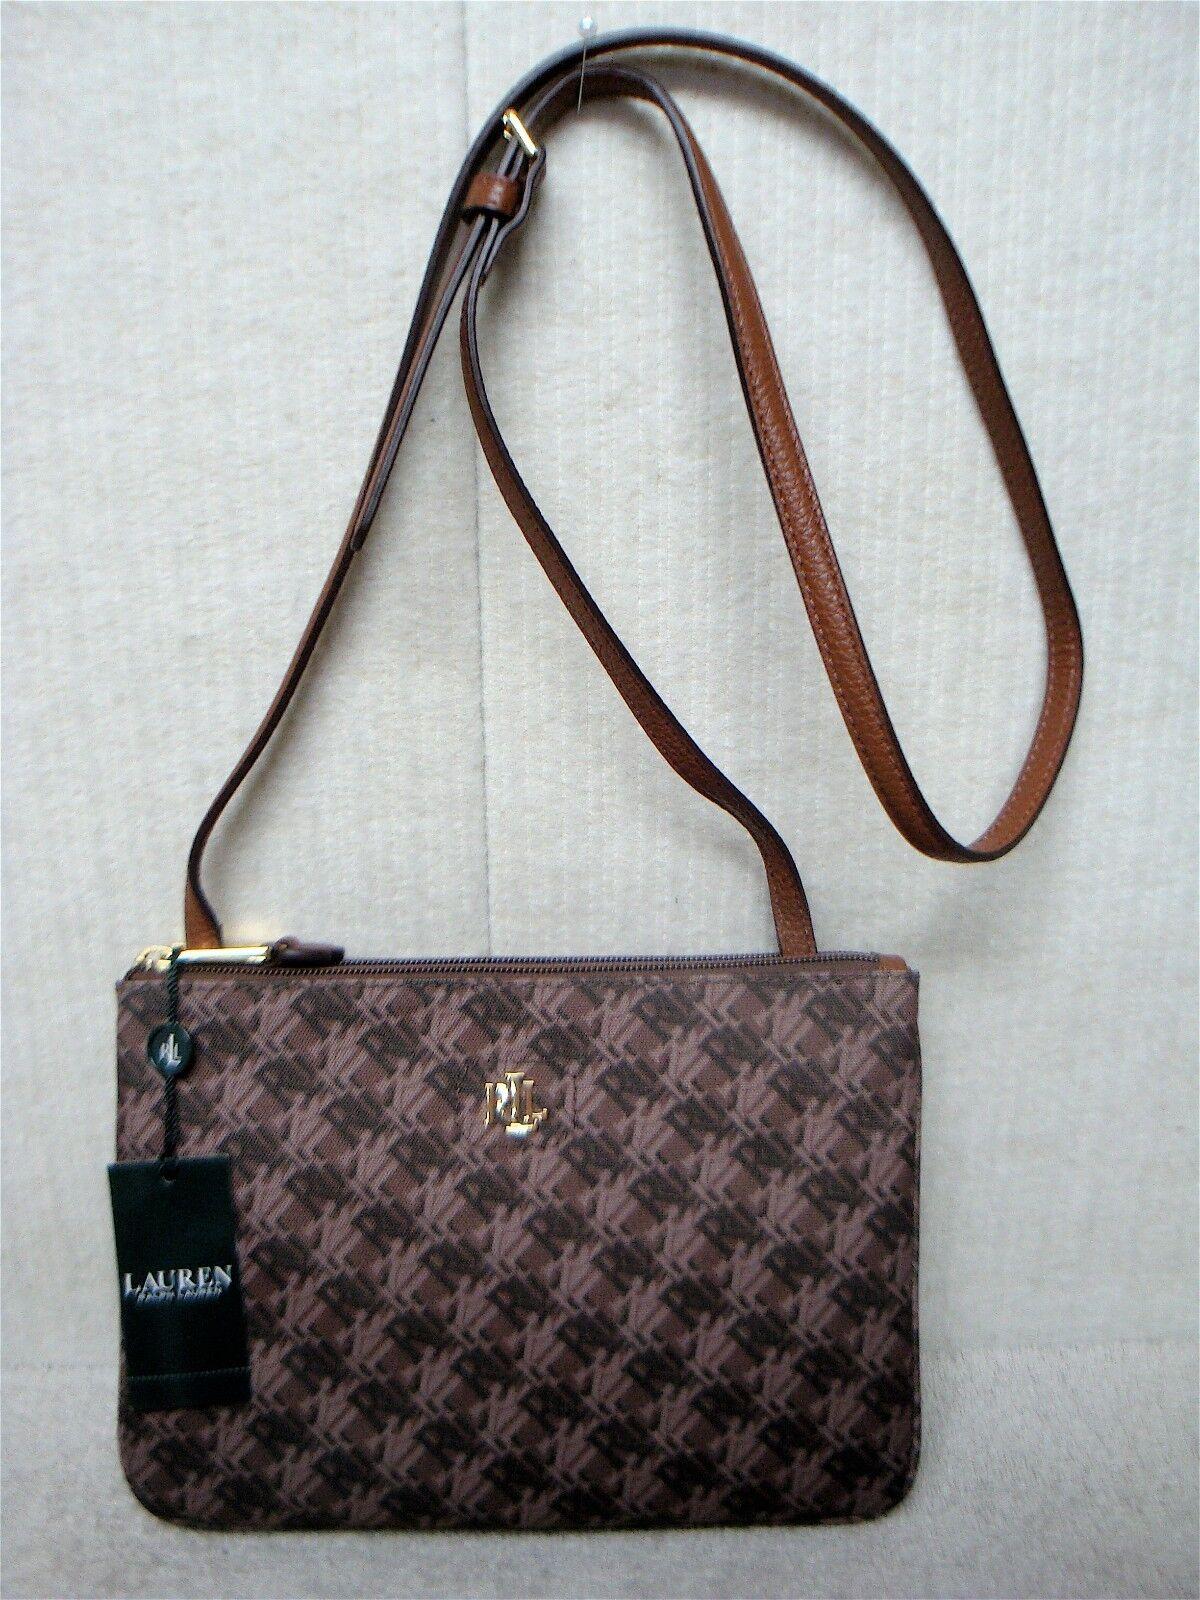 7664310530 Ralph Lauren Bainbridge Tara Crossbody Handbag - Brown for sale ...